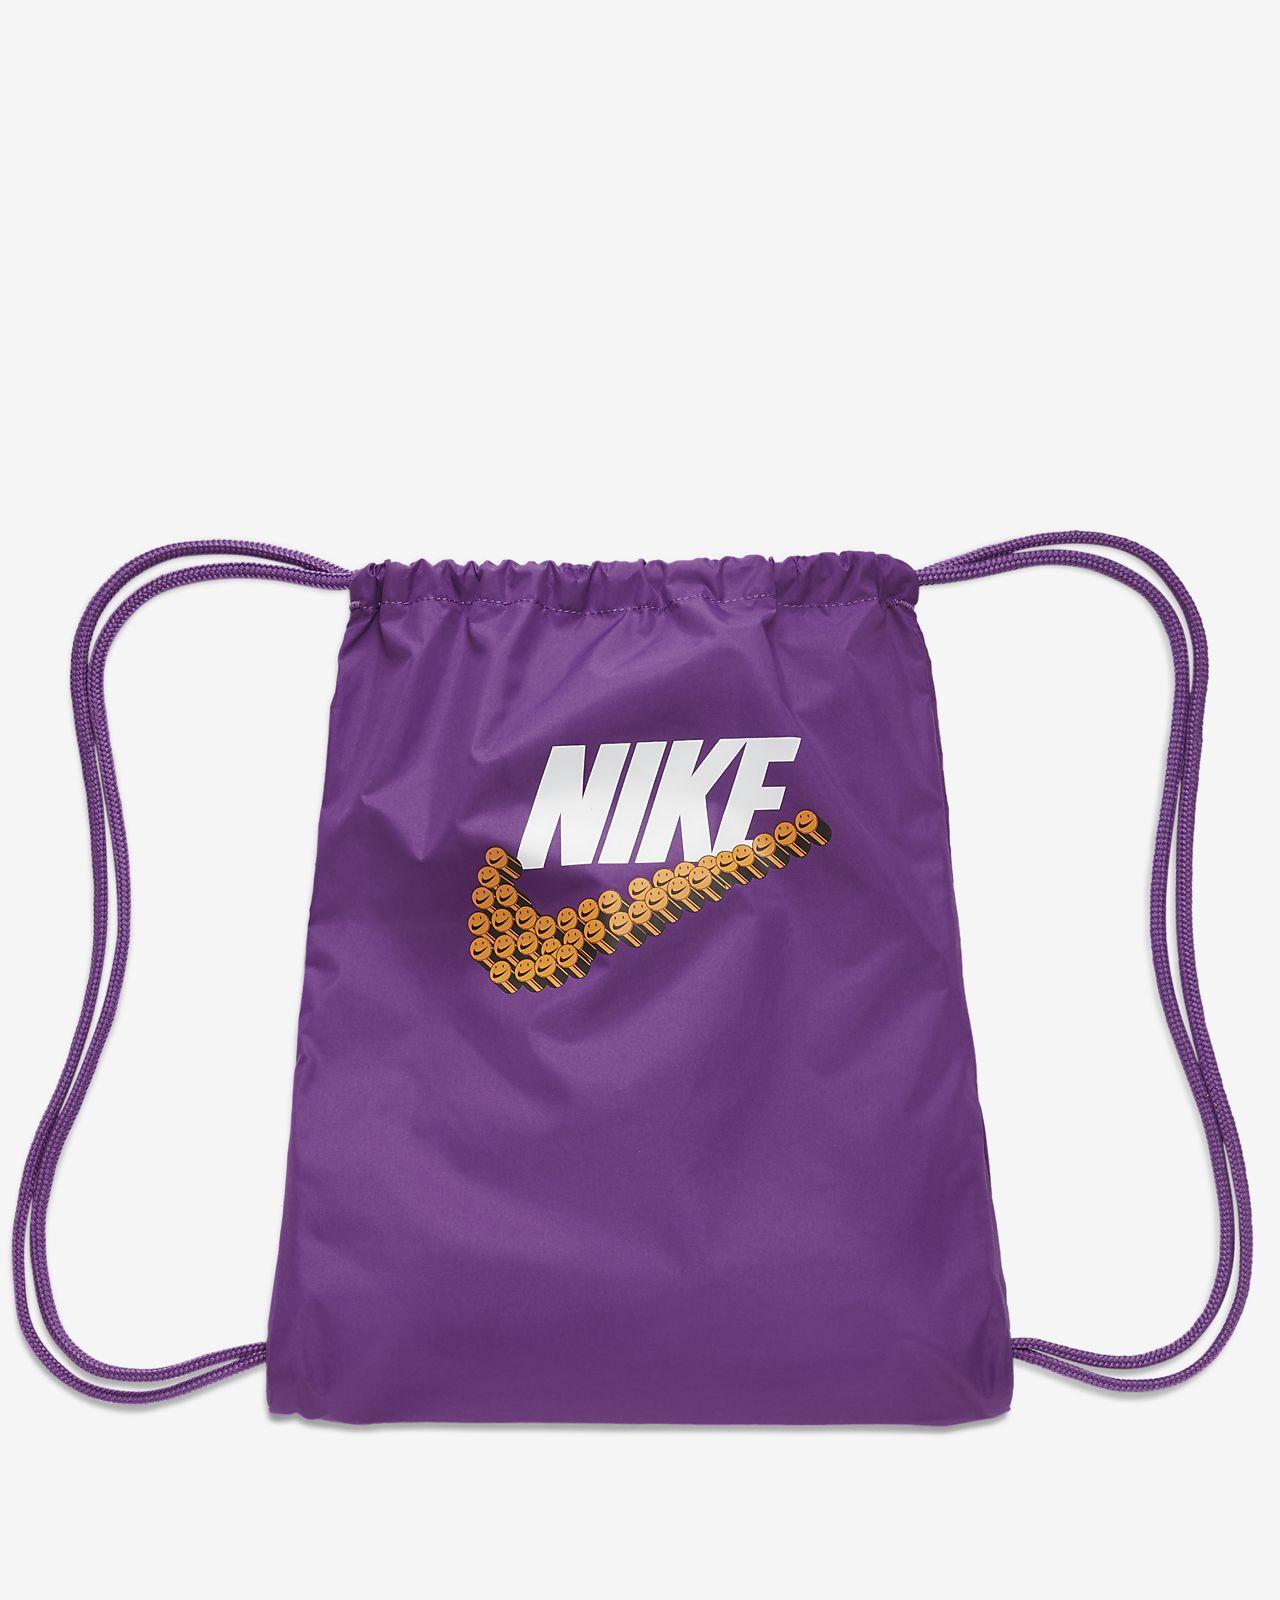 Мешок на завязках для детей Nike Graphic